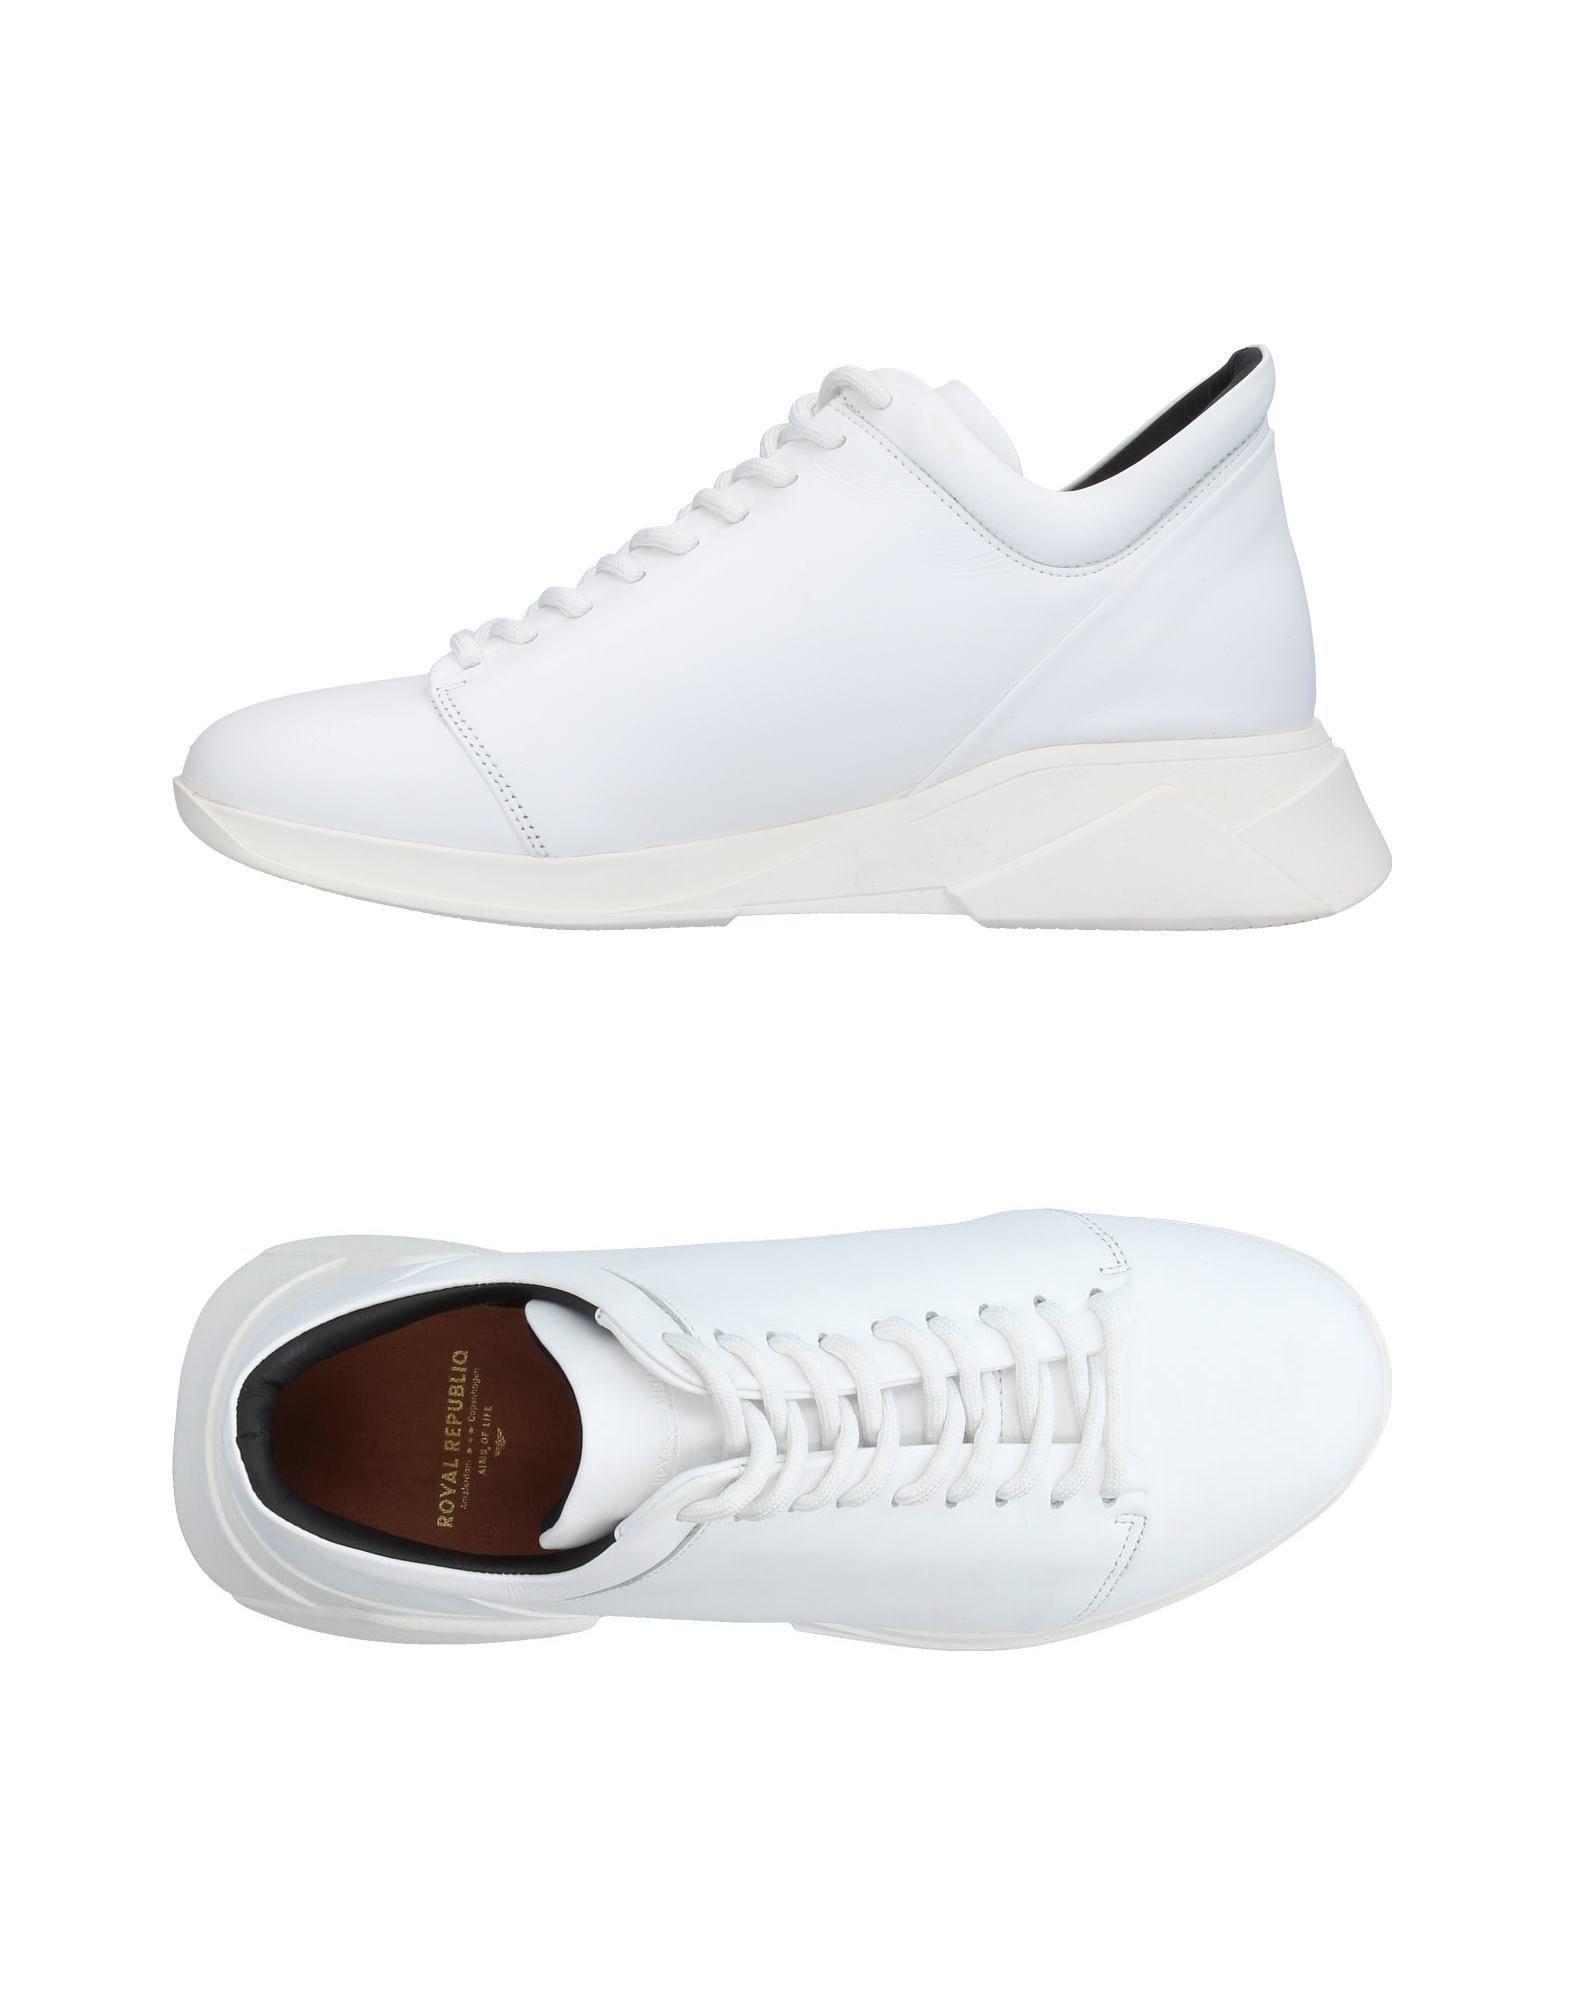 FOOTWEAR - Low-tops & sneakers Royal Republiq AYXiM1jLC2